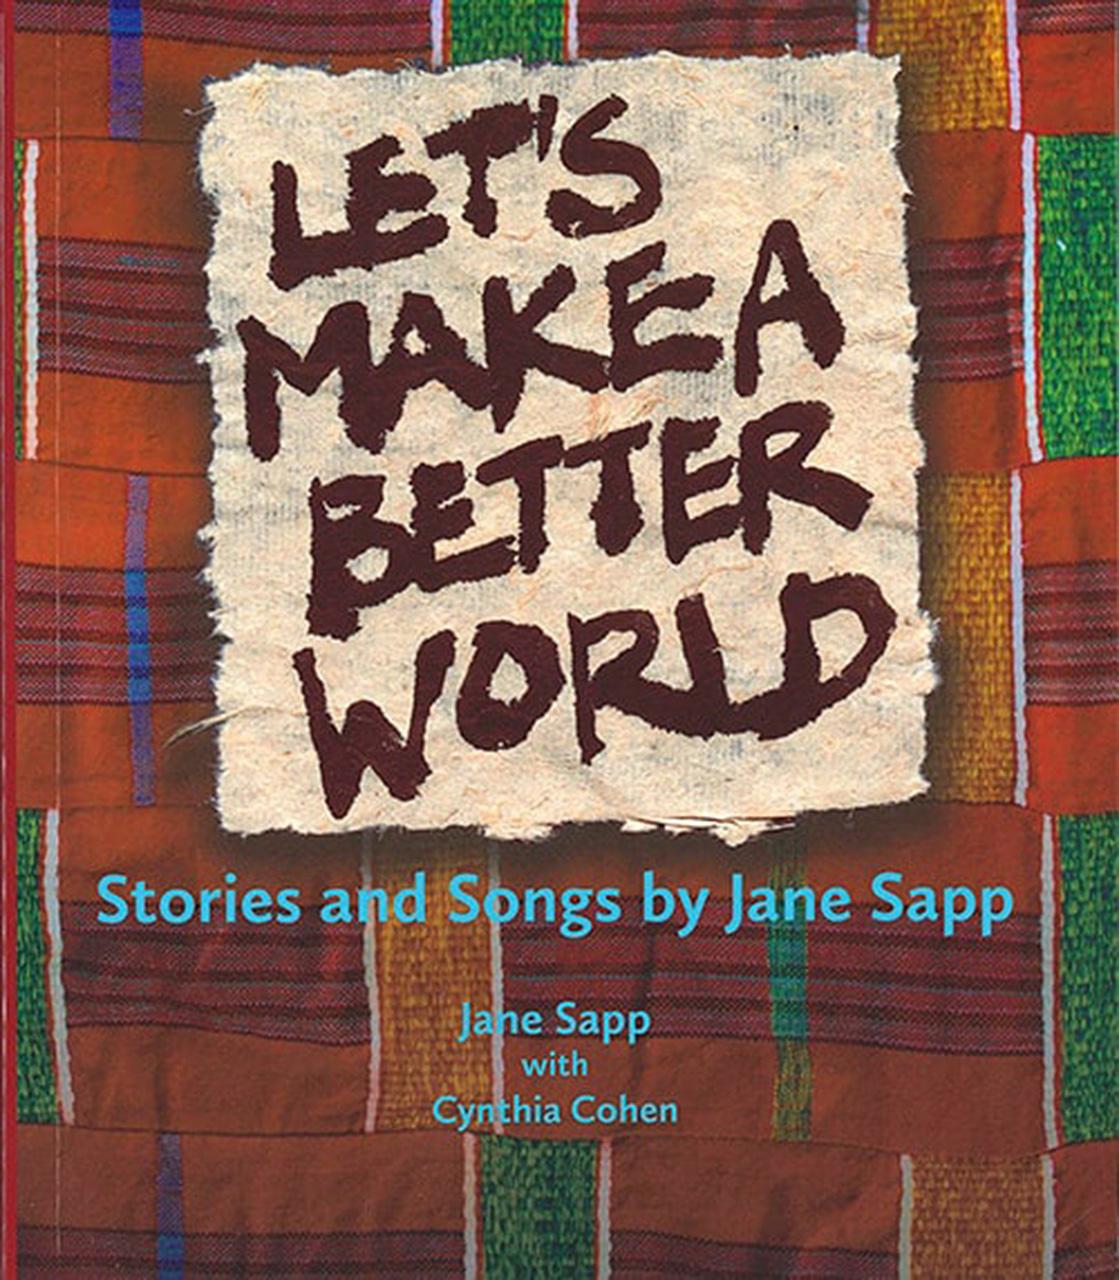 Let's Make a Better World